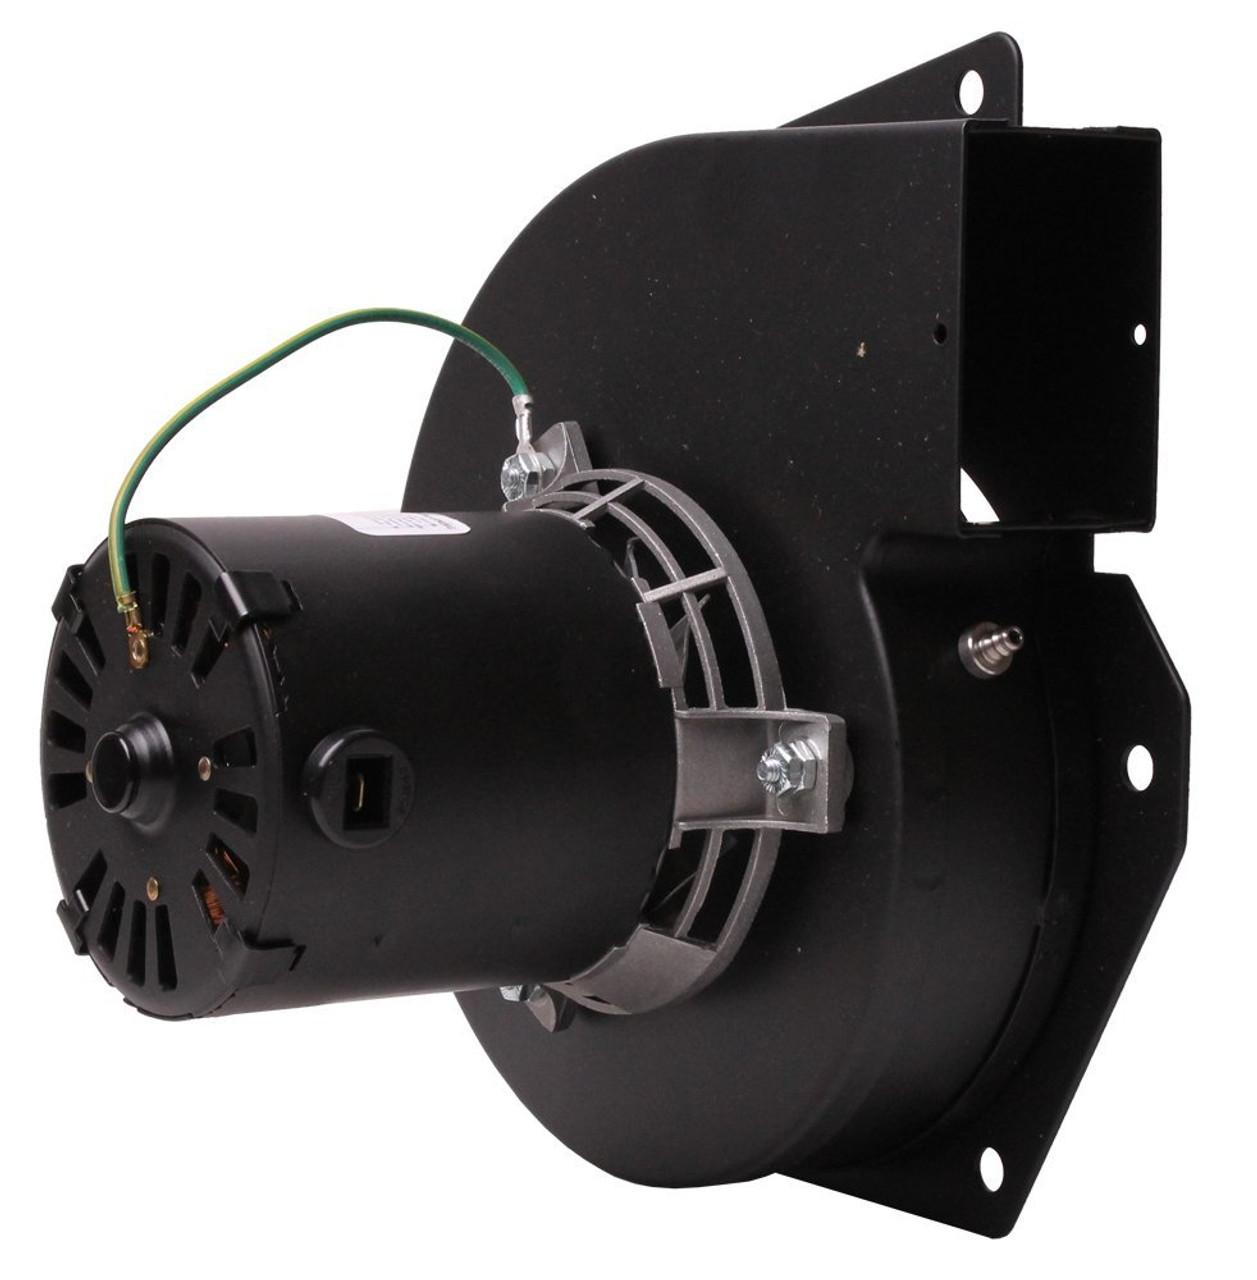 intercity furnace hq1054268fa draft inducer blower 208 230v fasco a148 [ 982 x 1000 Pixel ]